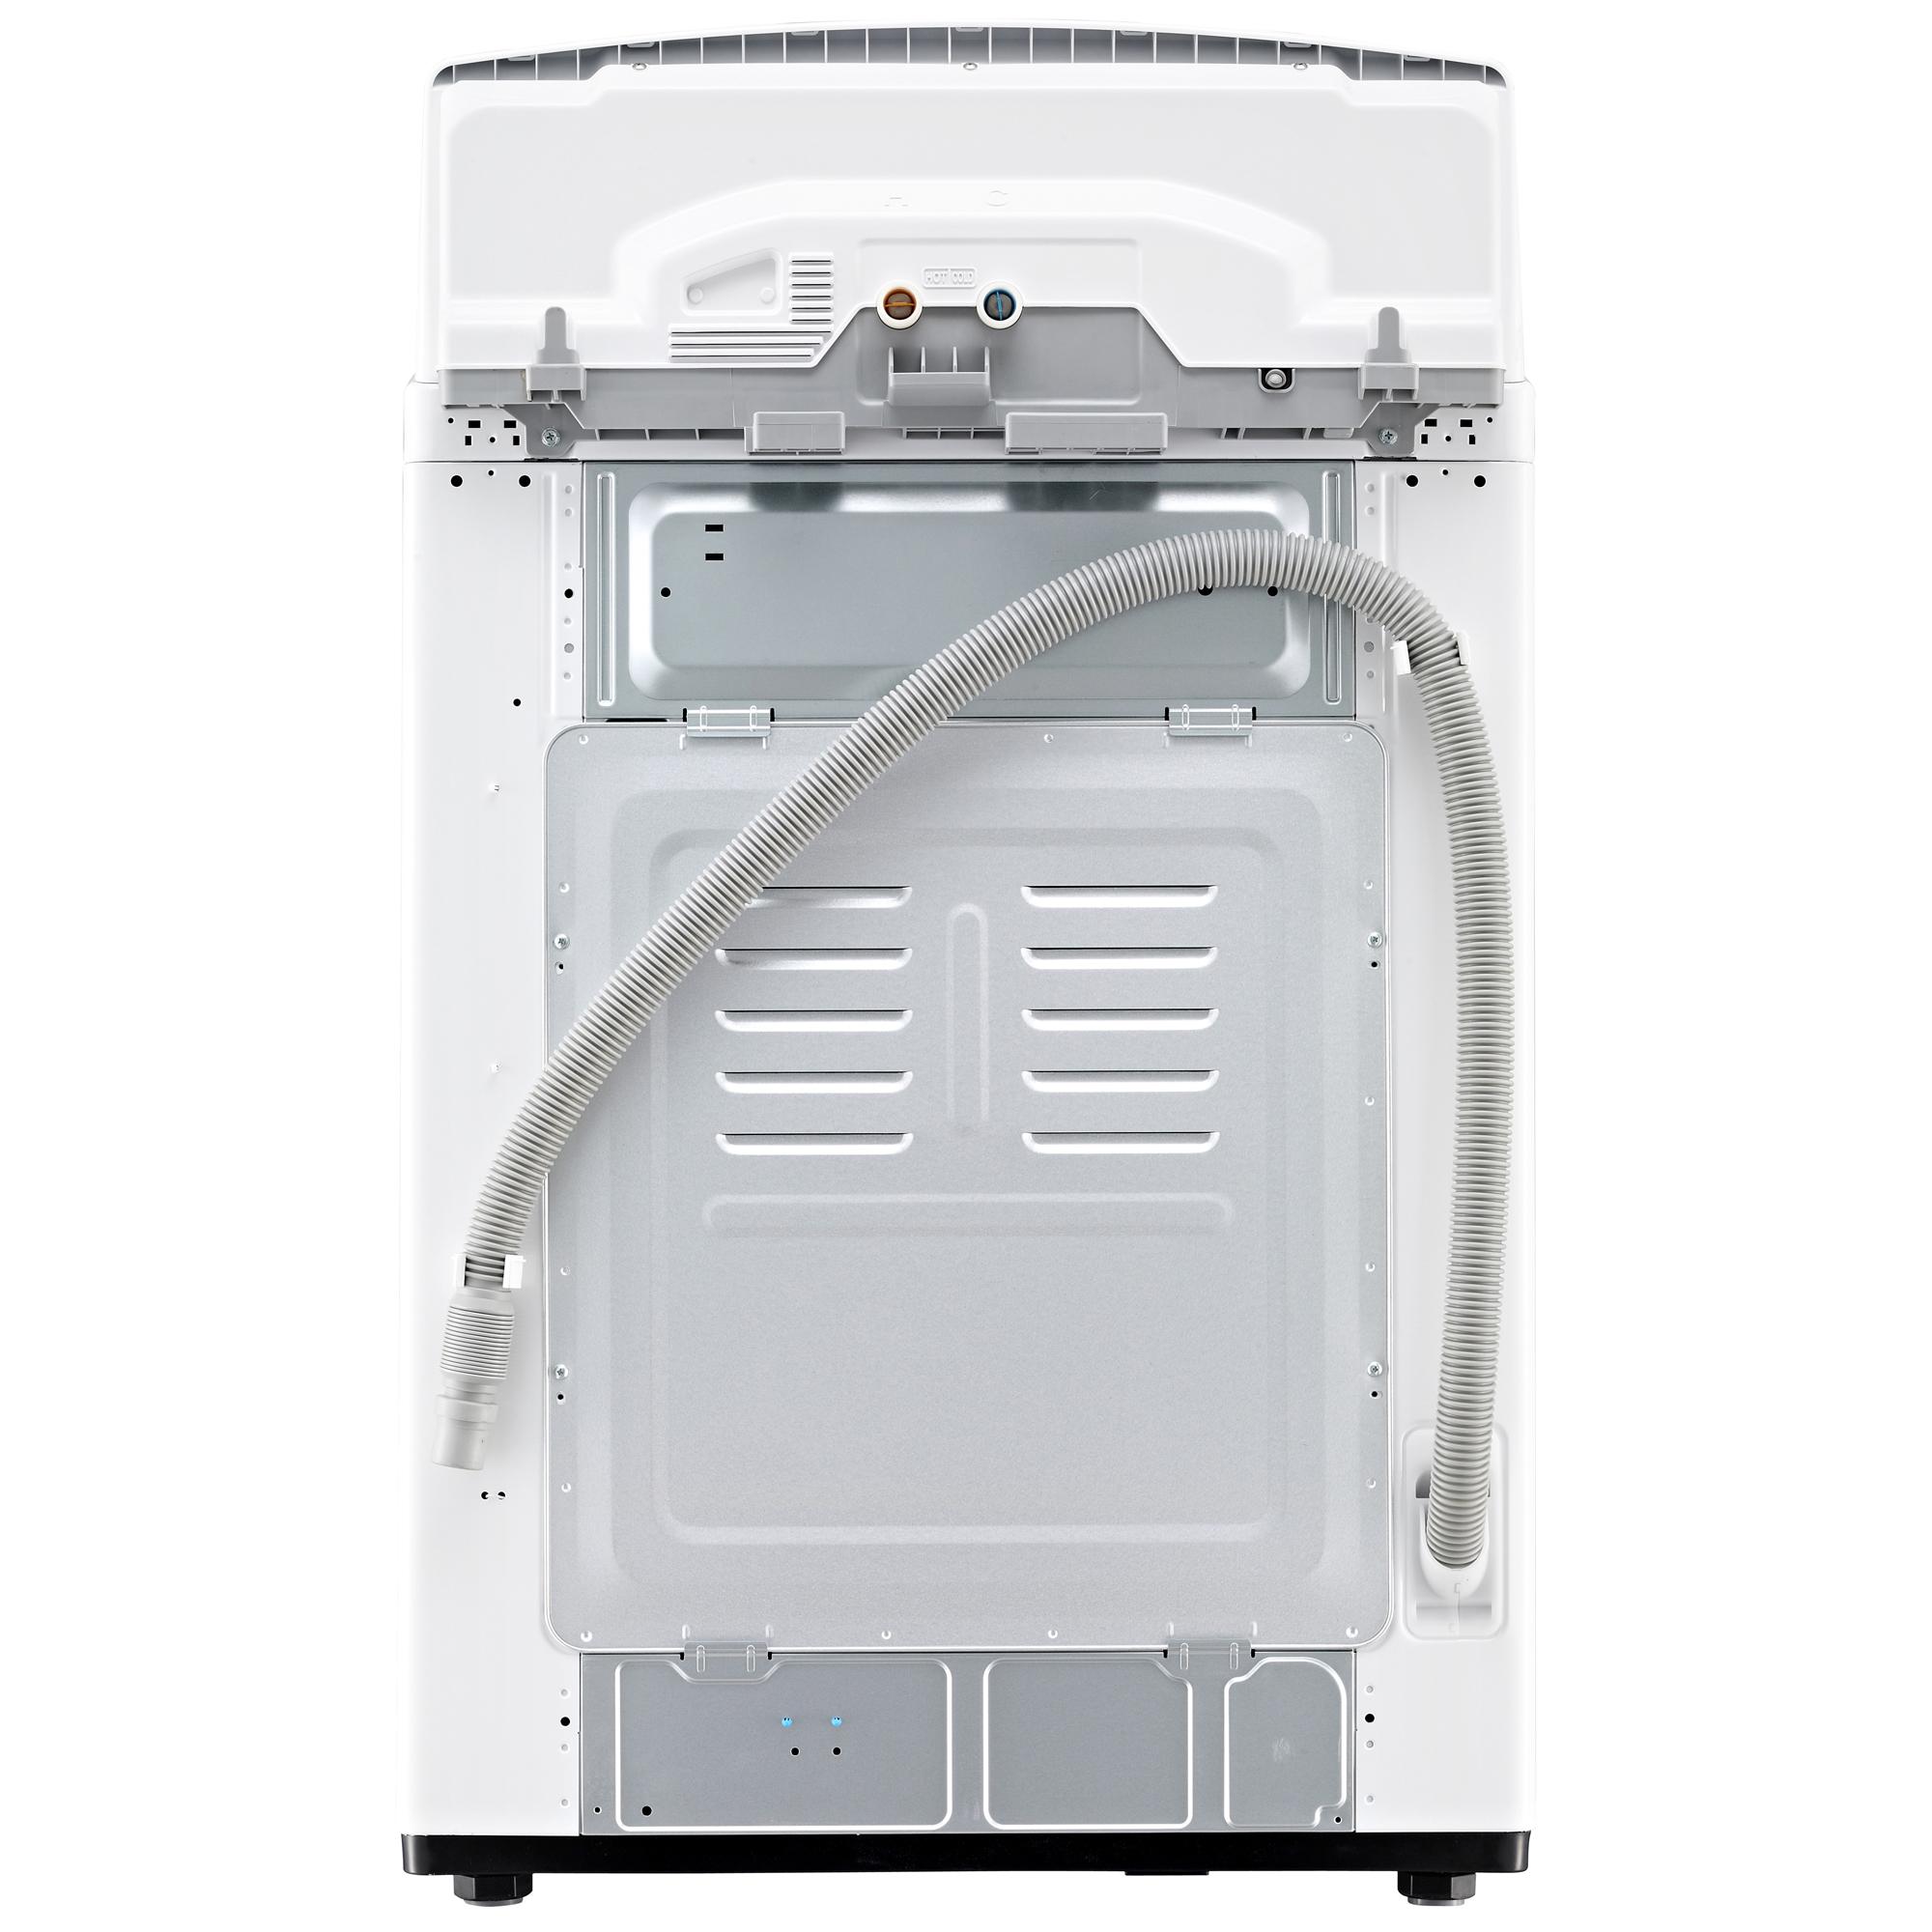 LG WT5480CW 5.0 cu.ft. Capacity Top Load Washer w/ TurboWash® – White